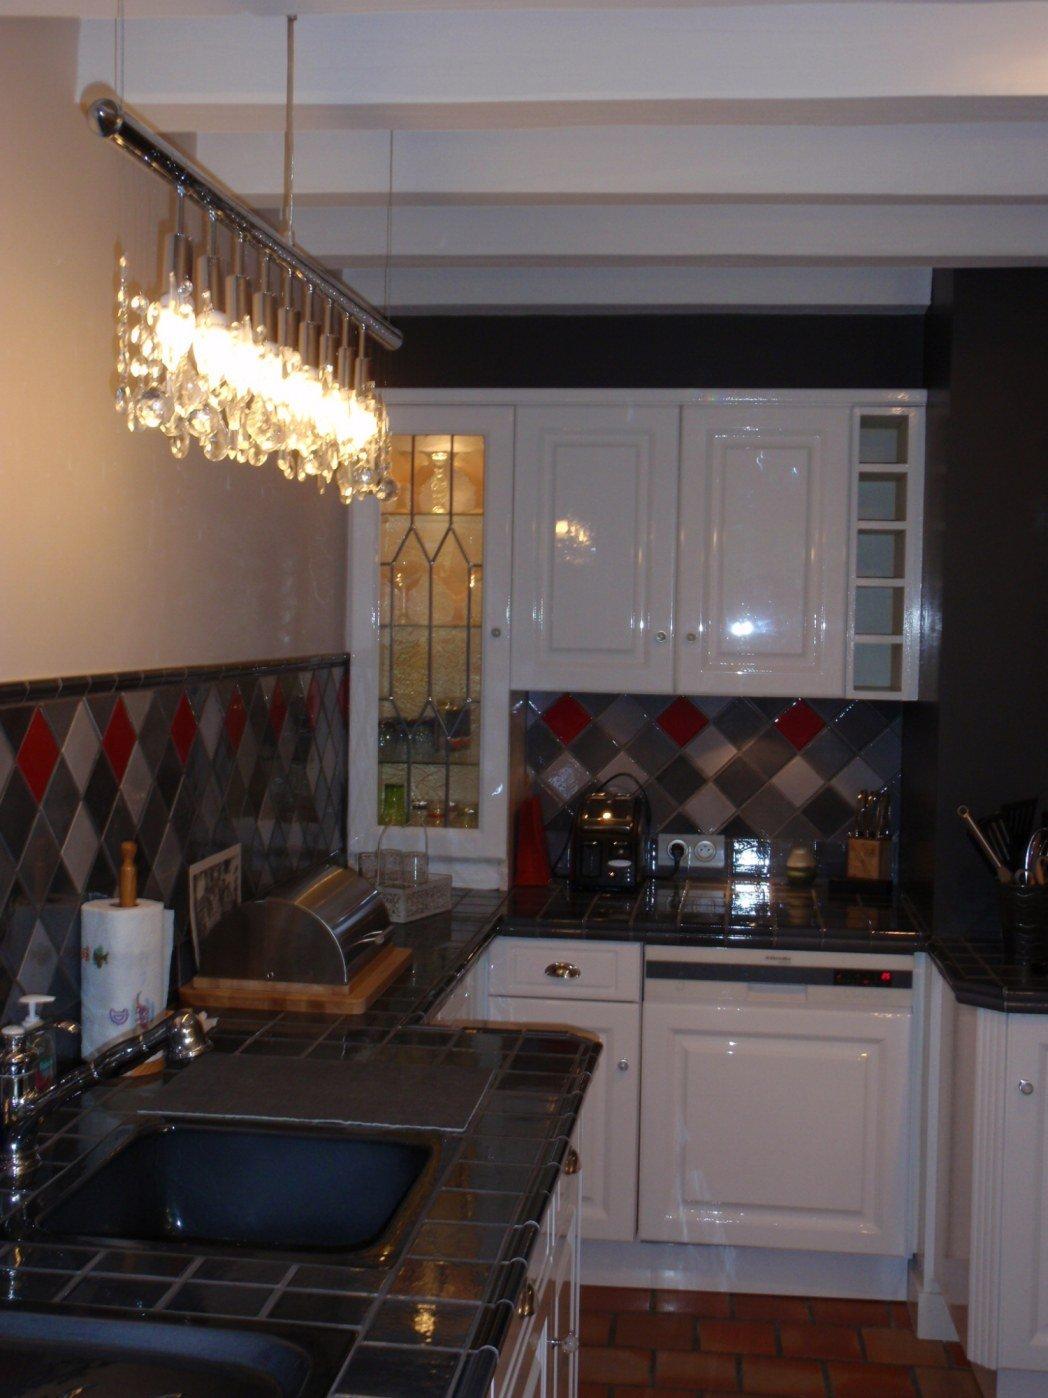 Home staging cuisine - Vallée peintures